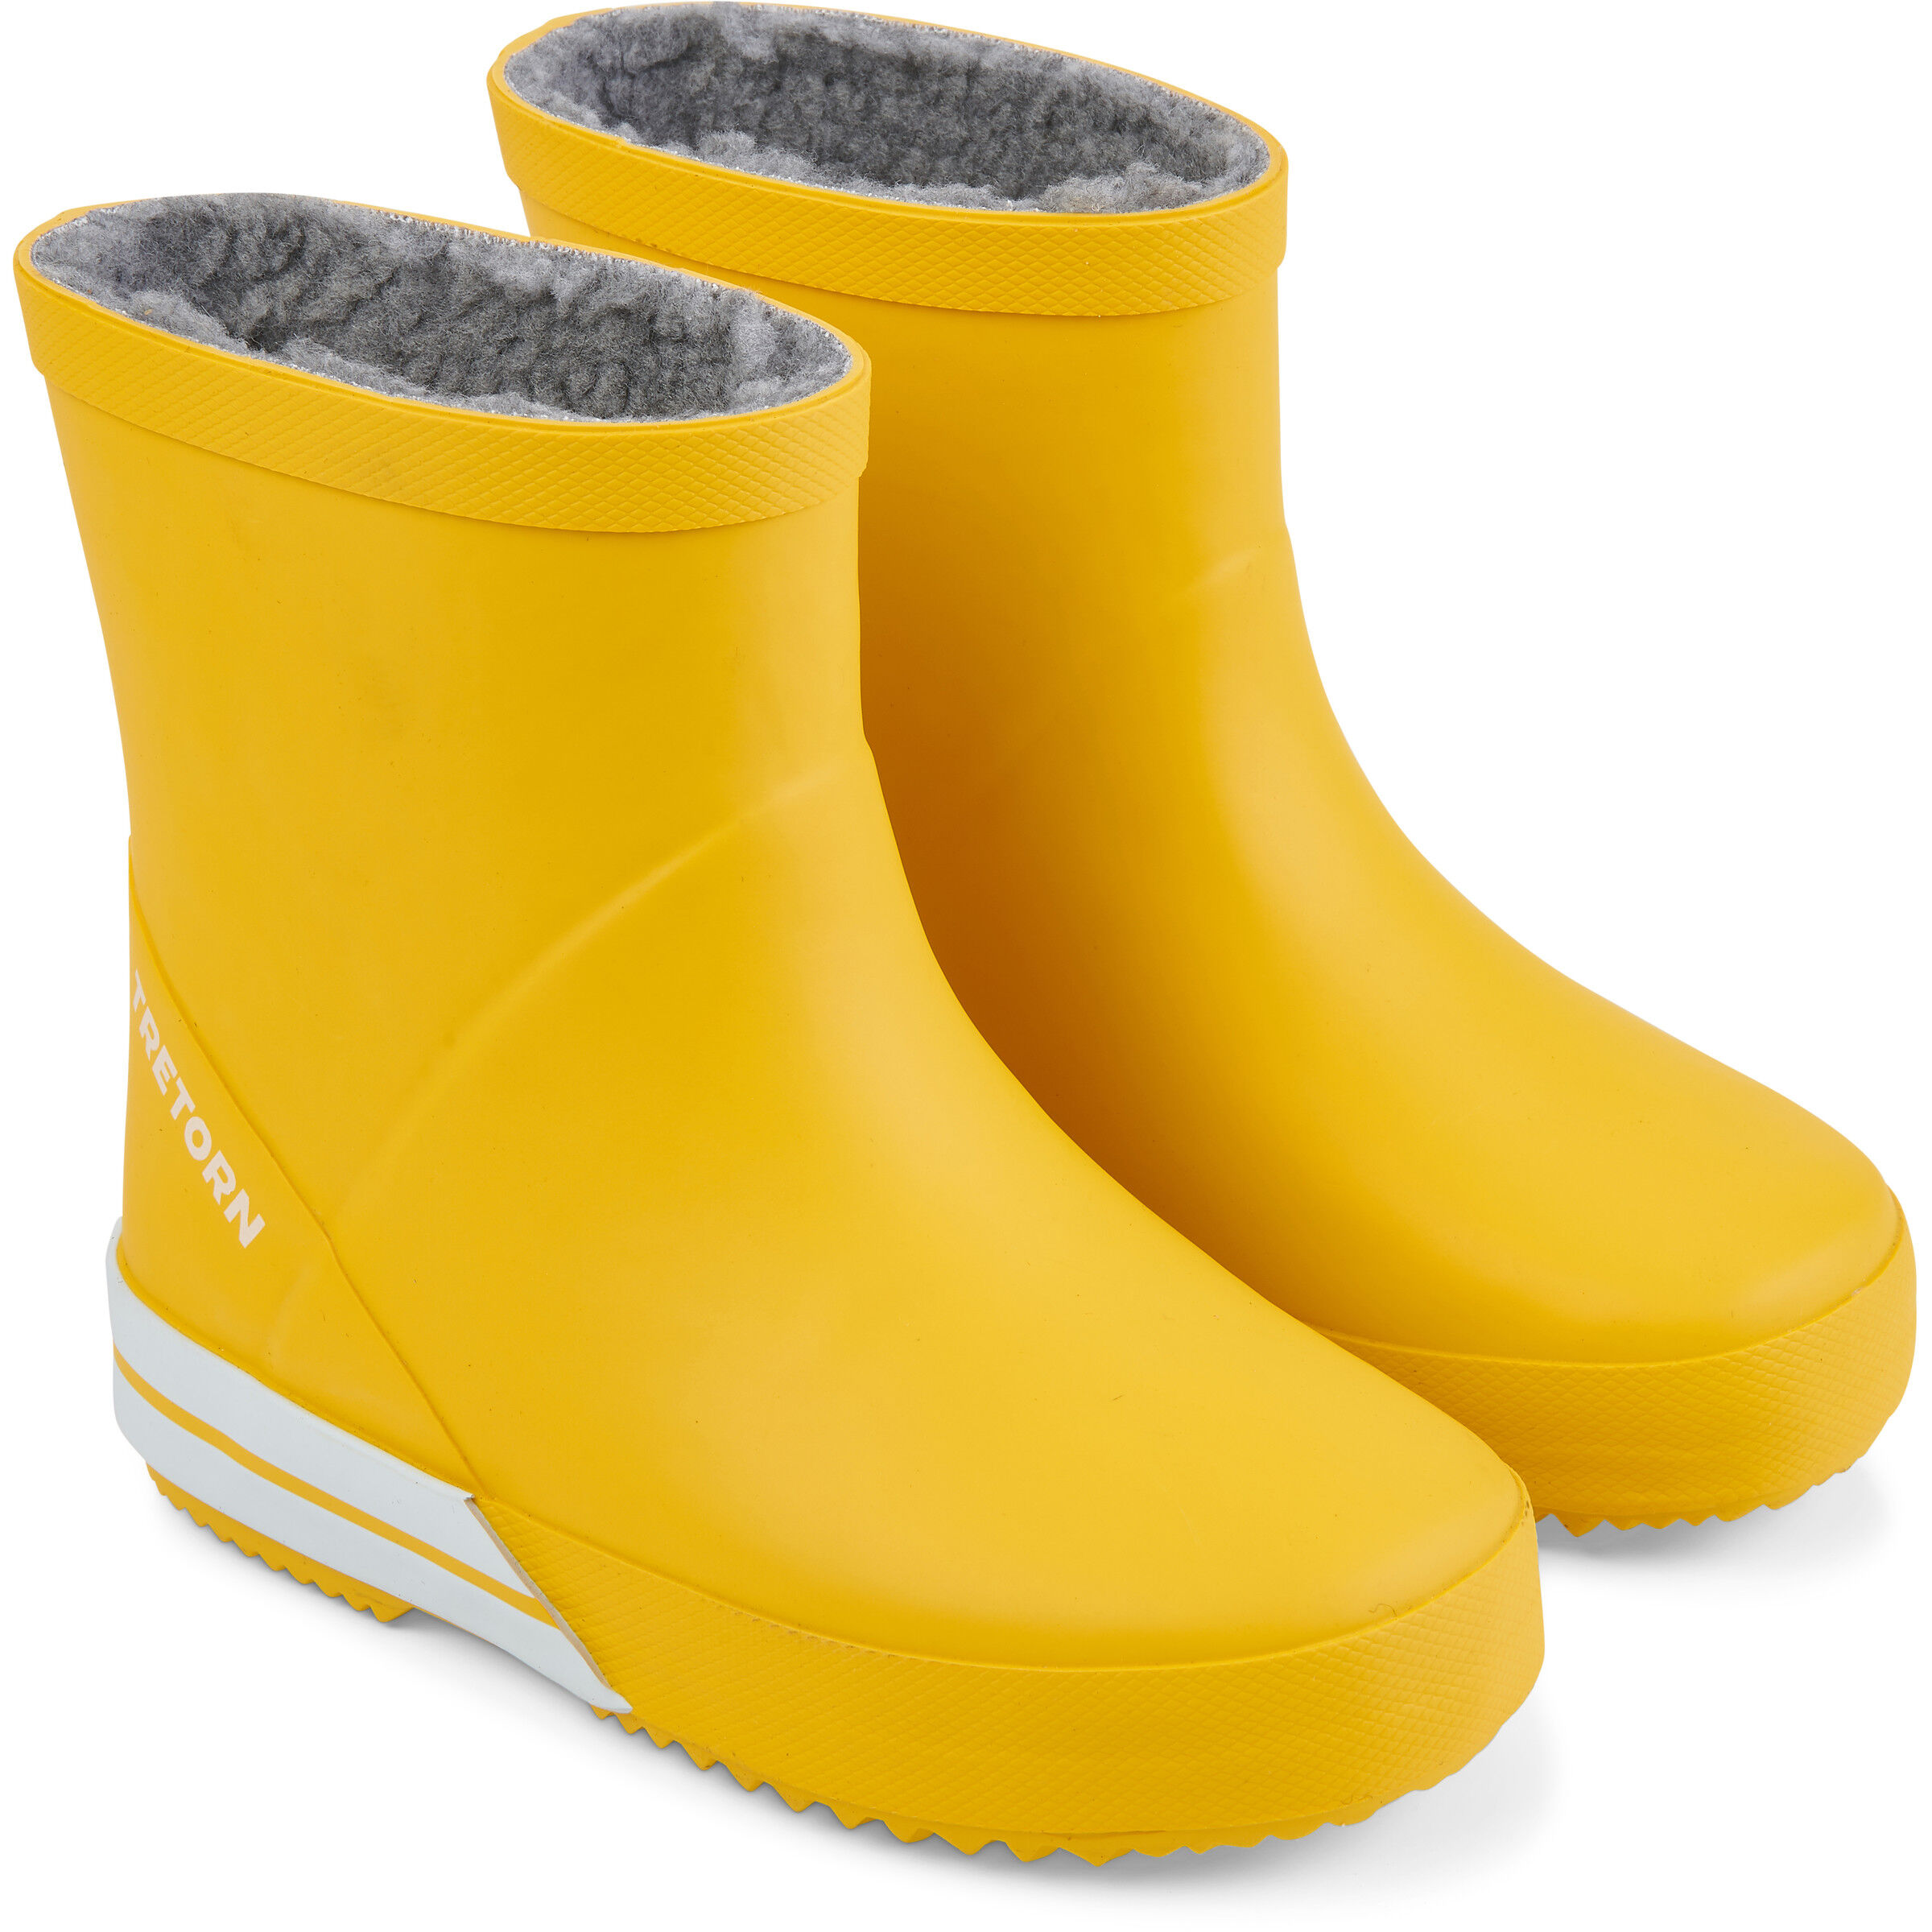 Tretorn Basic Winter Rubber Boots Barn Spectra Yellow